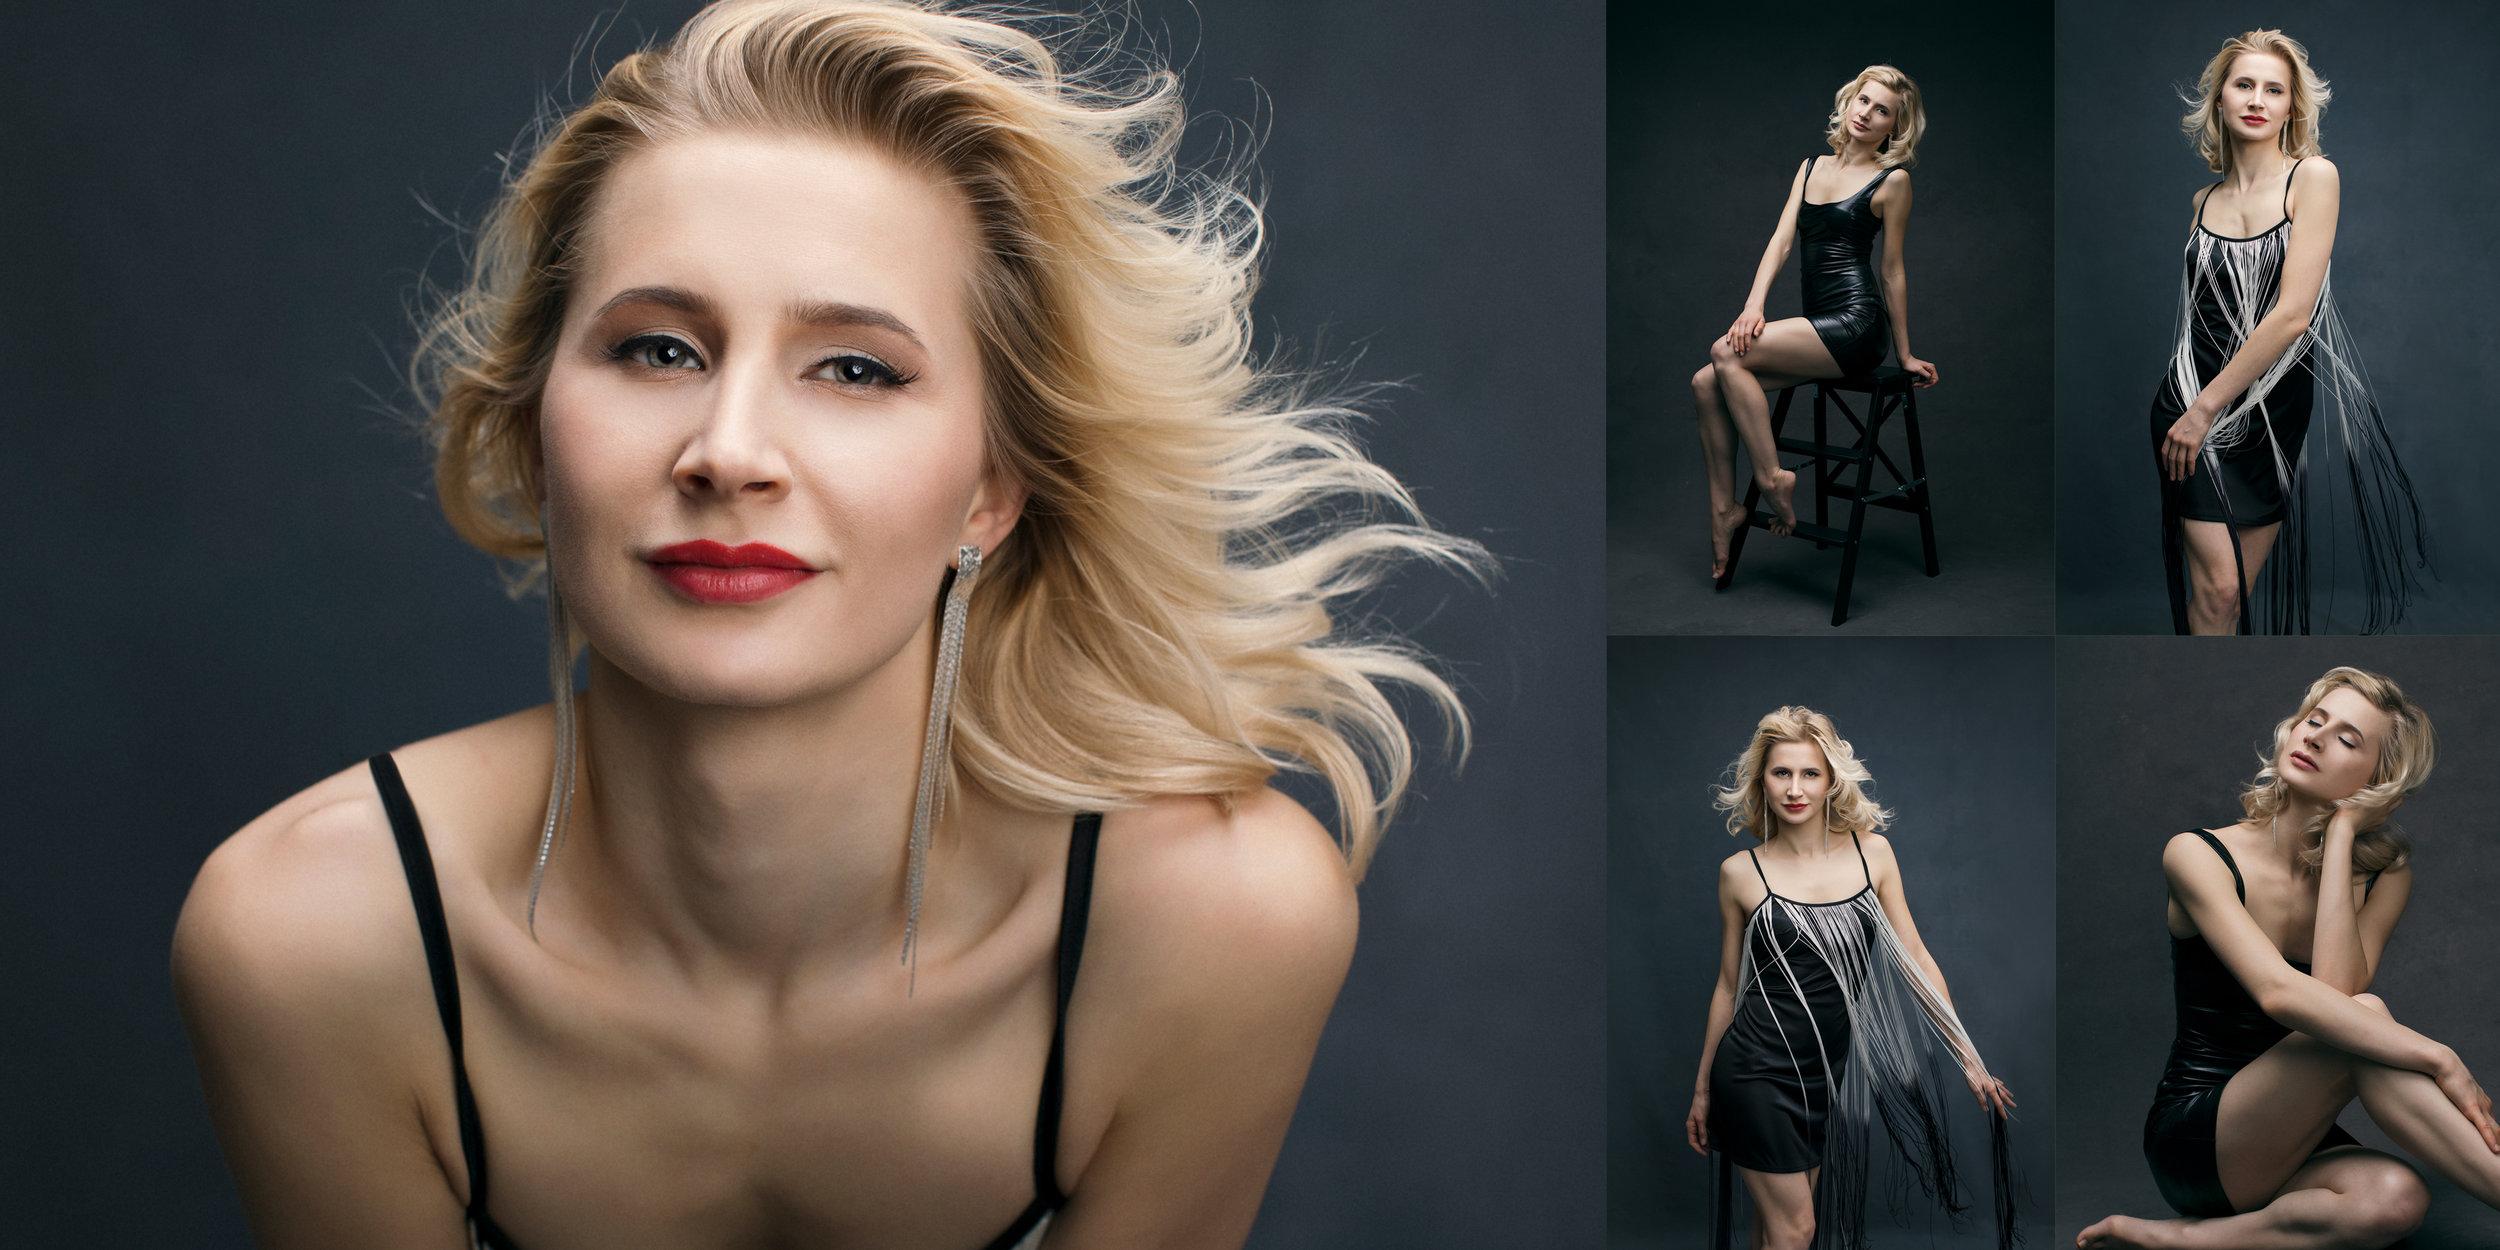 Amazing Portraits from a luxury photo shoot with Mayumi Acosta Photography.jpg